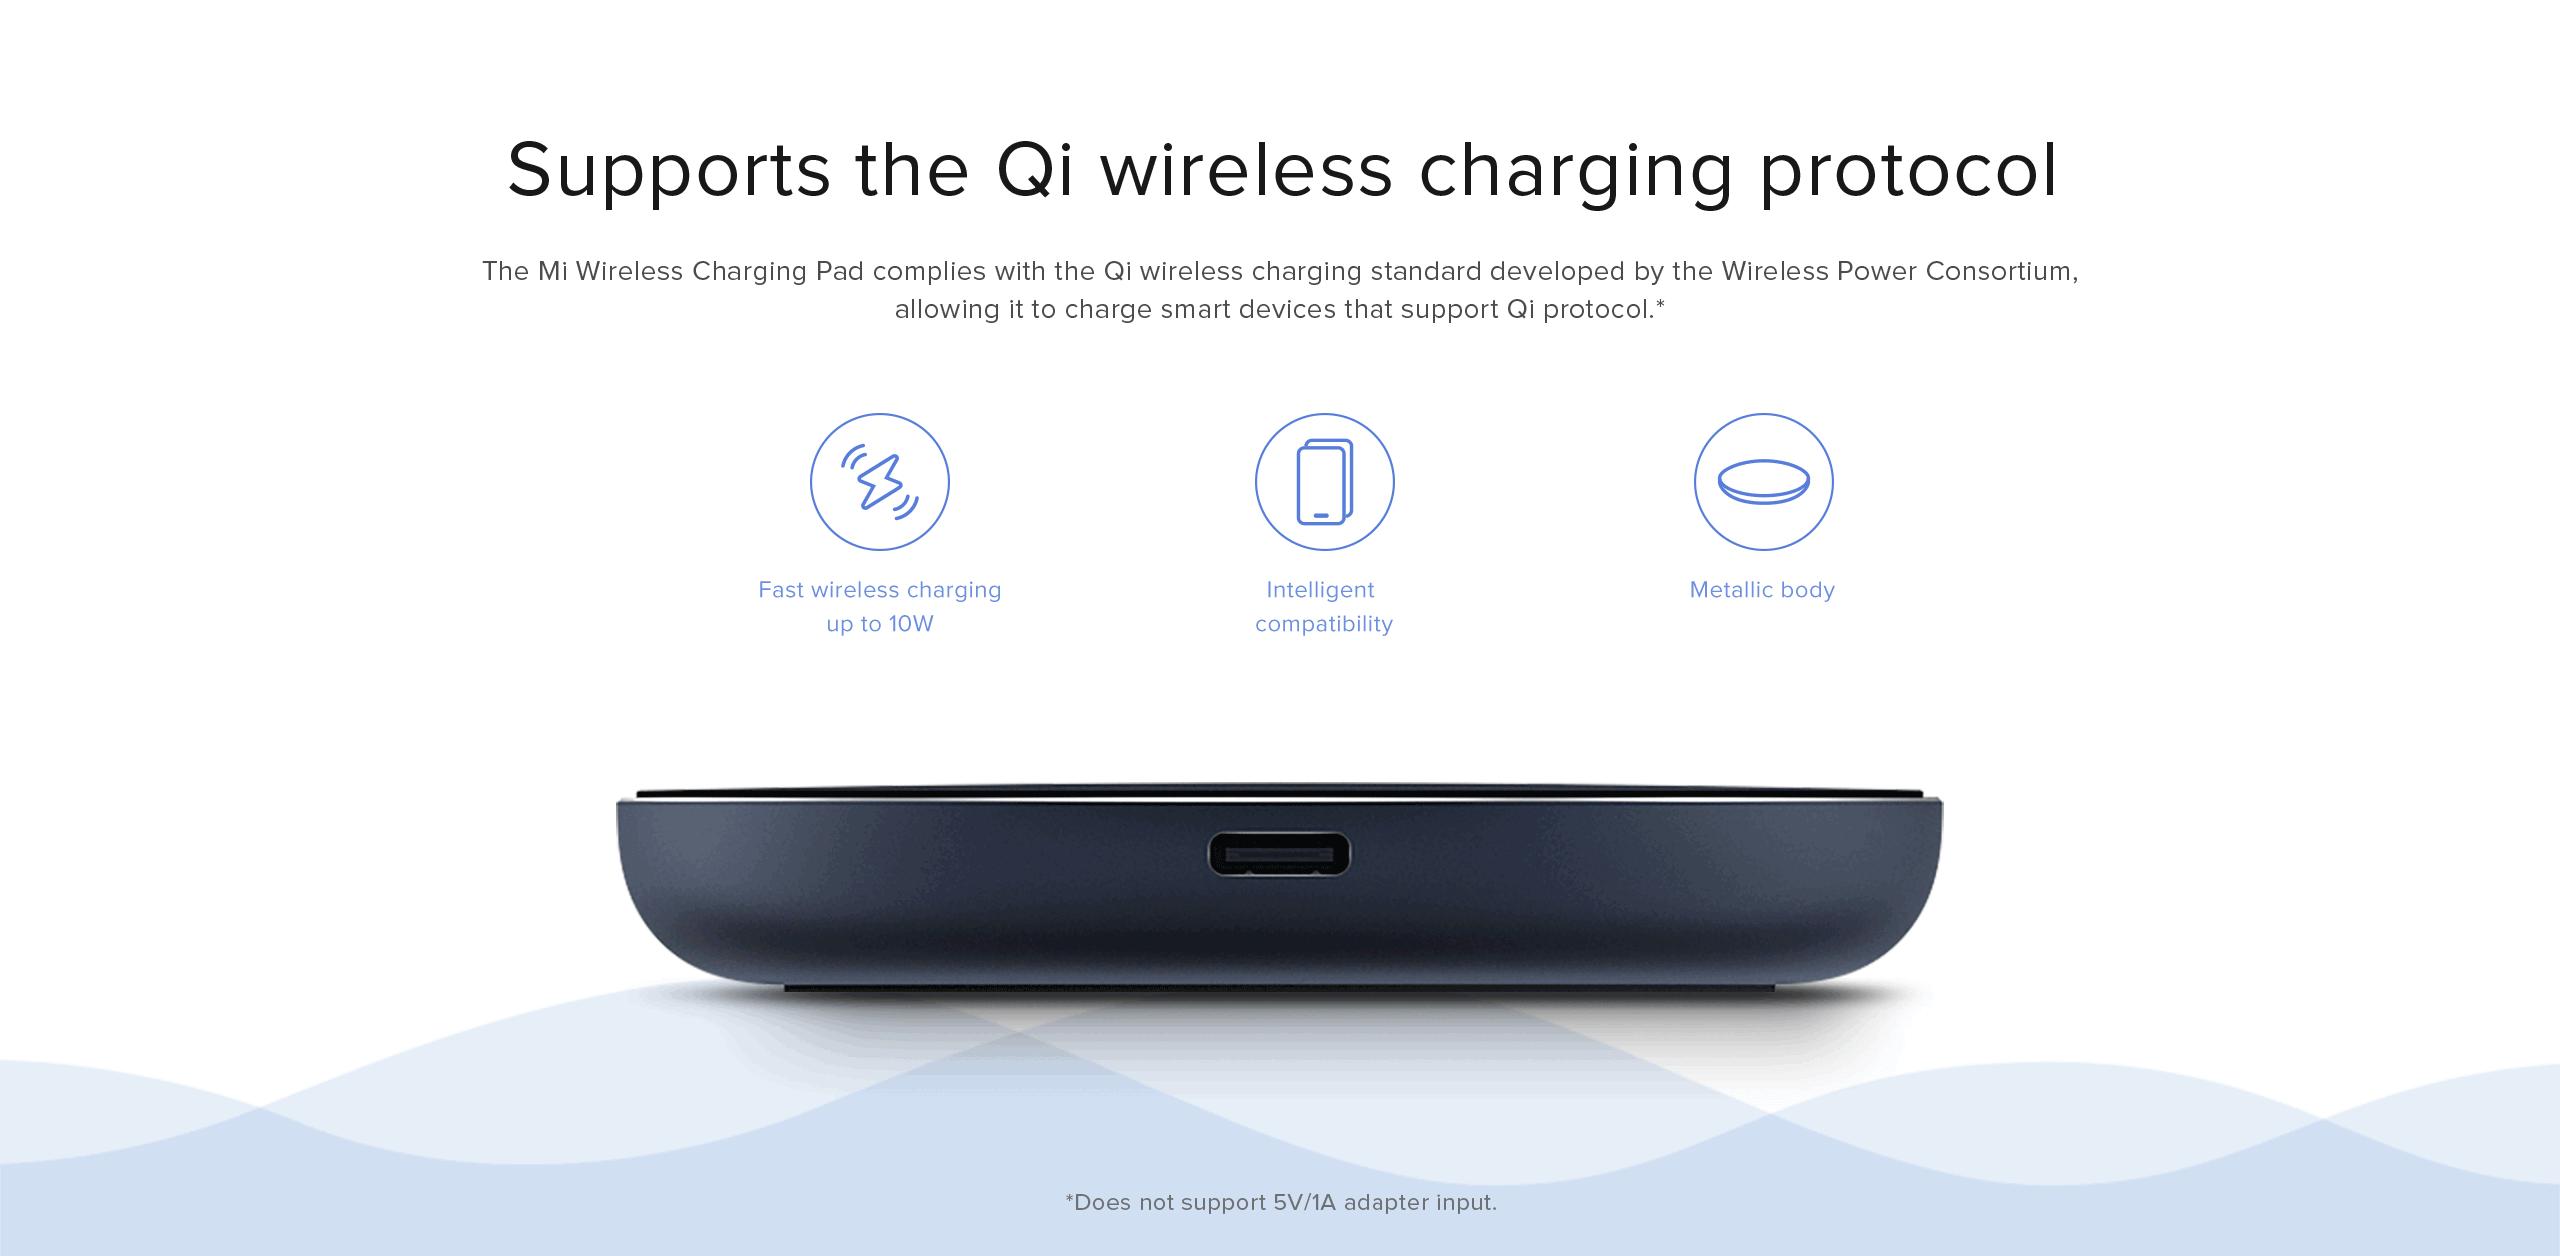 xiaomi mi wireless charing pad charger - Xiaomi United States